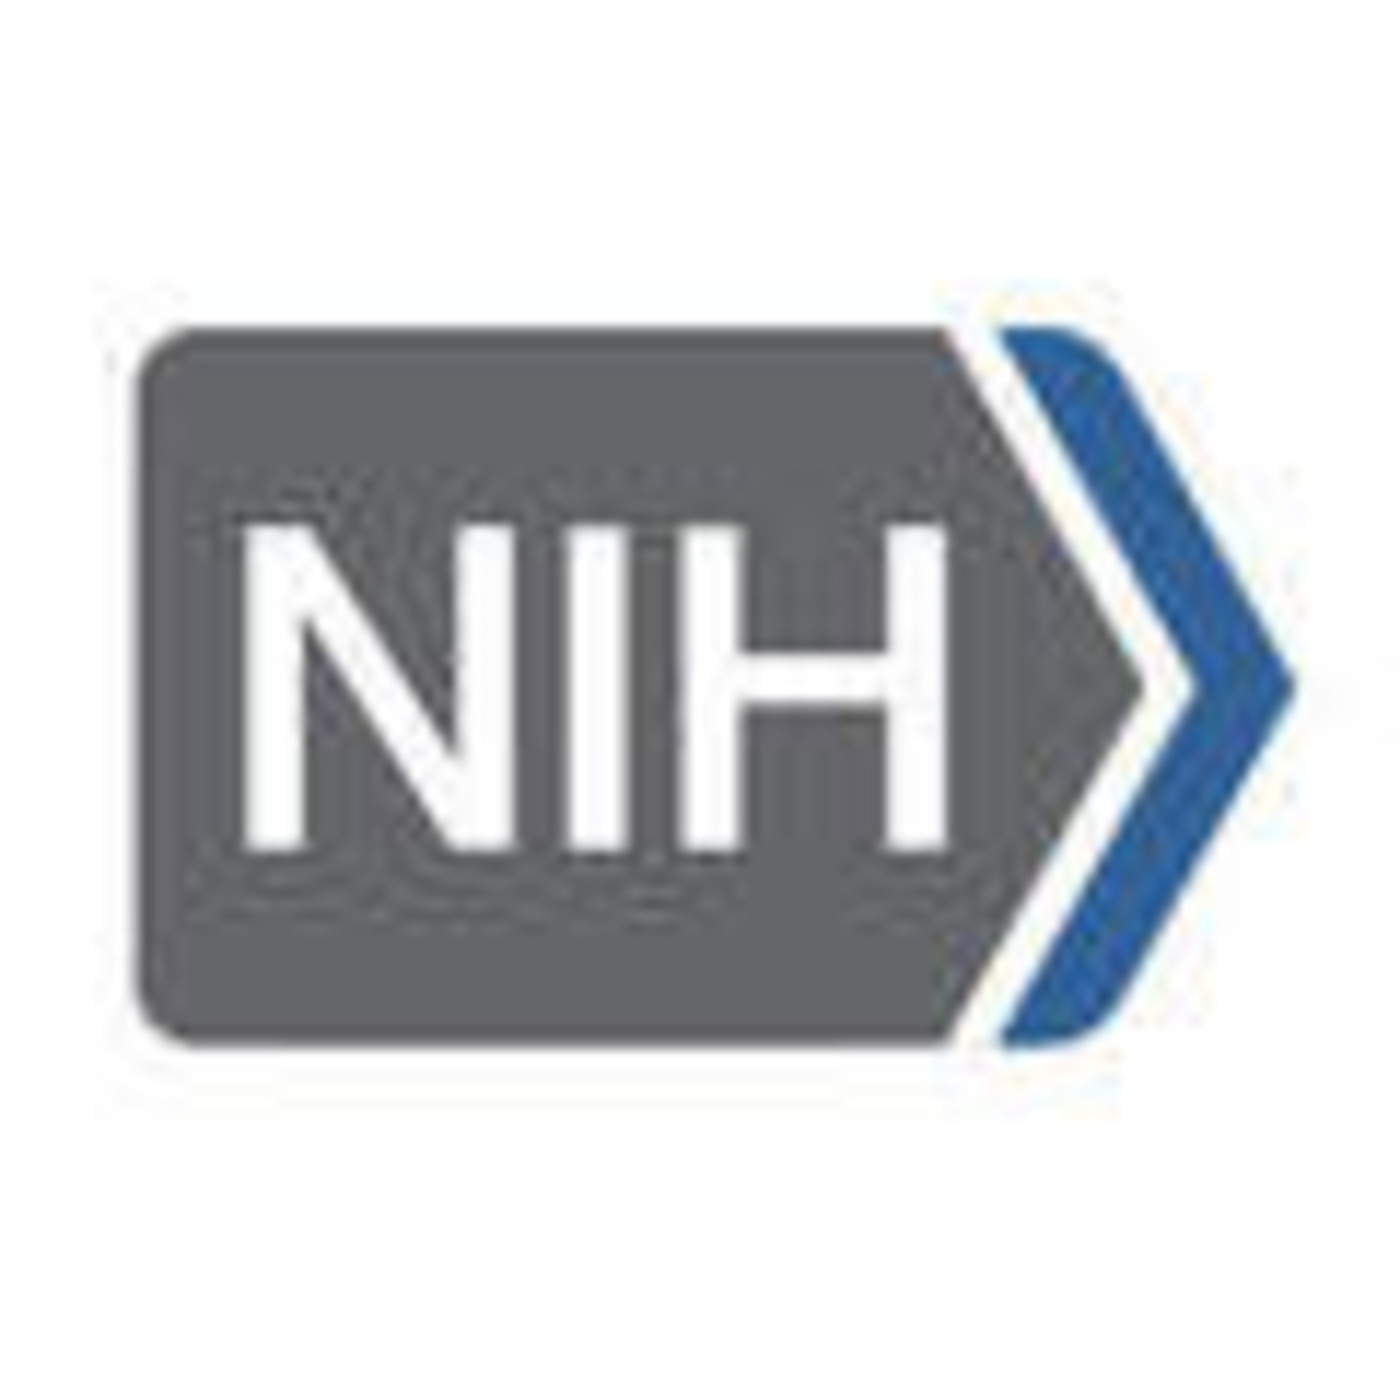 NIH Podcasts